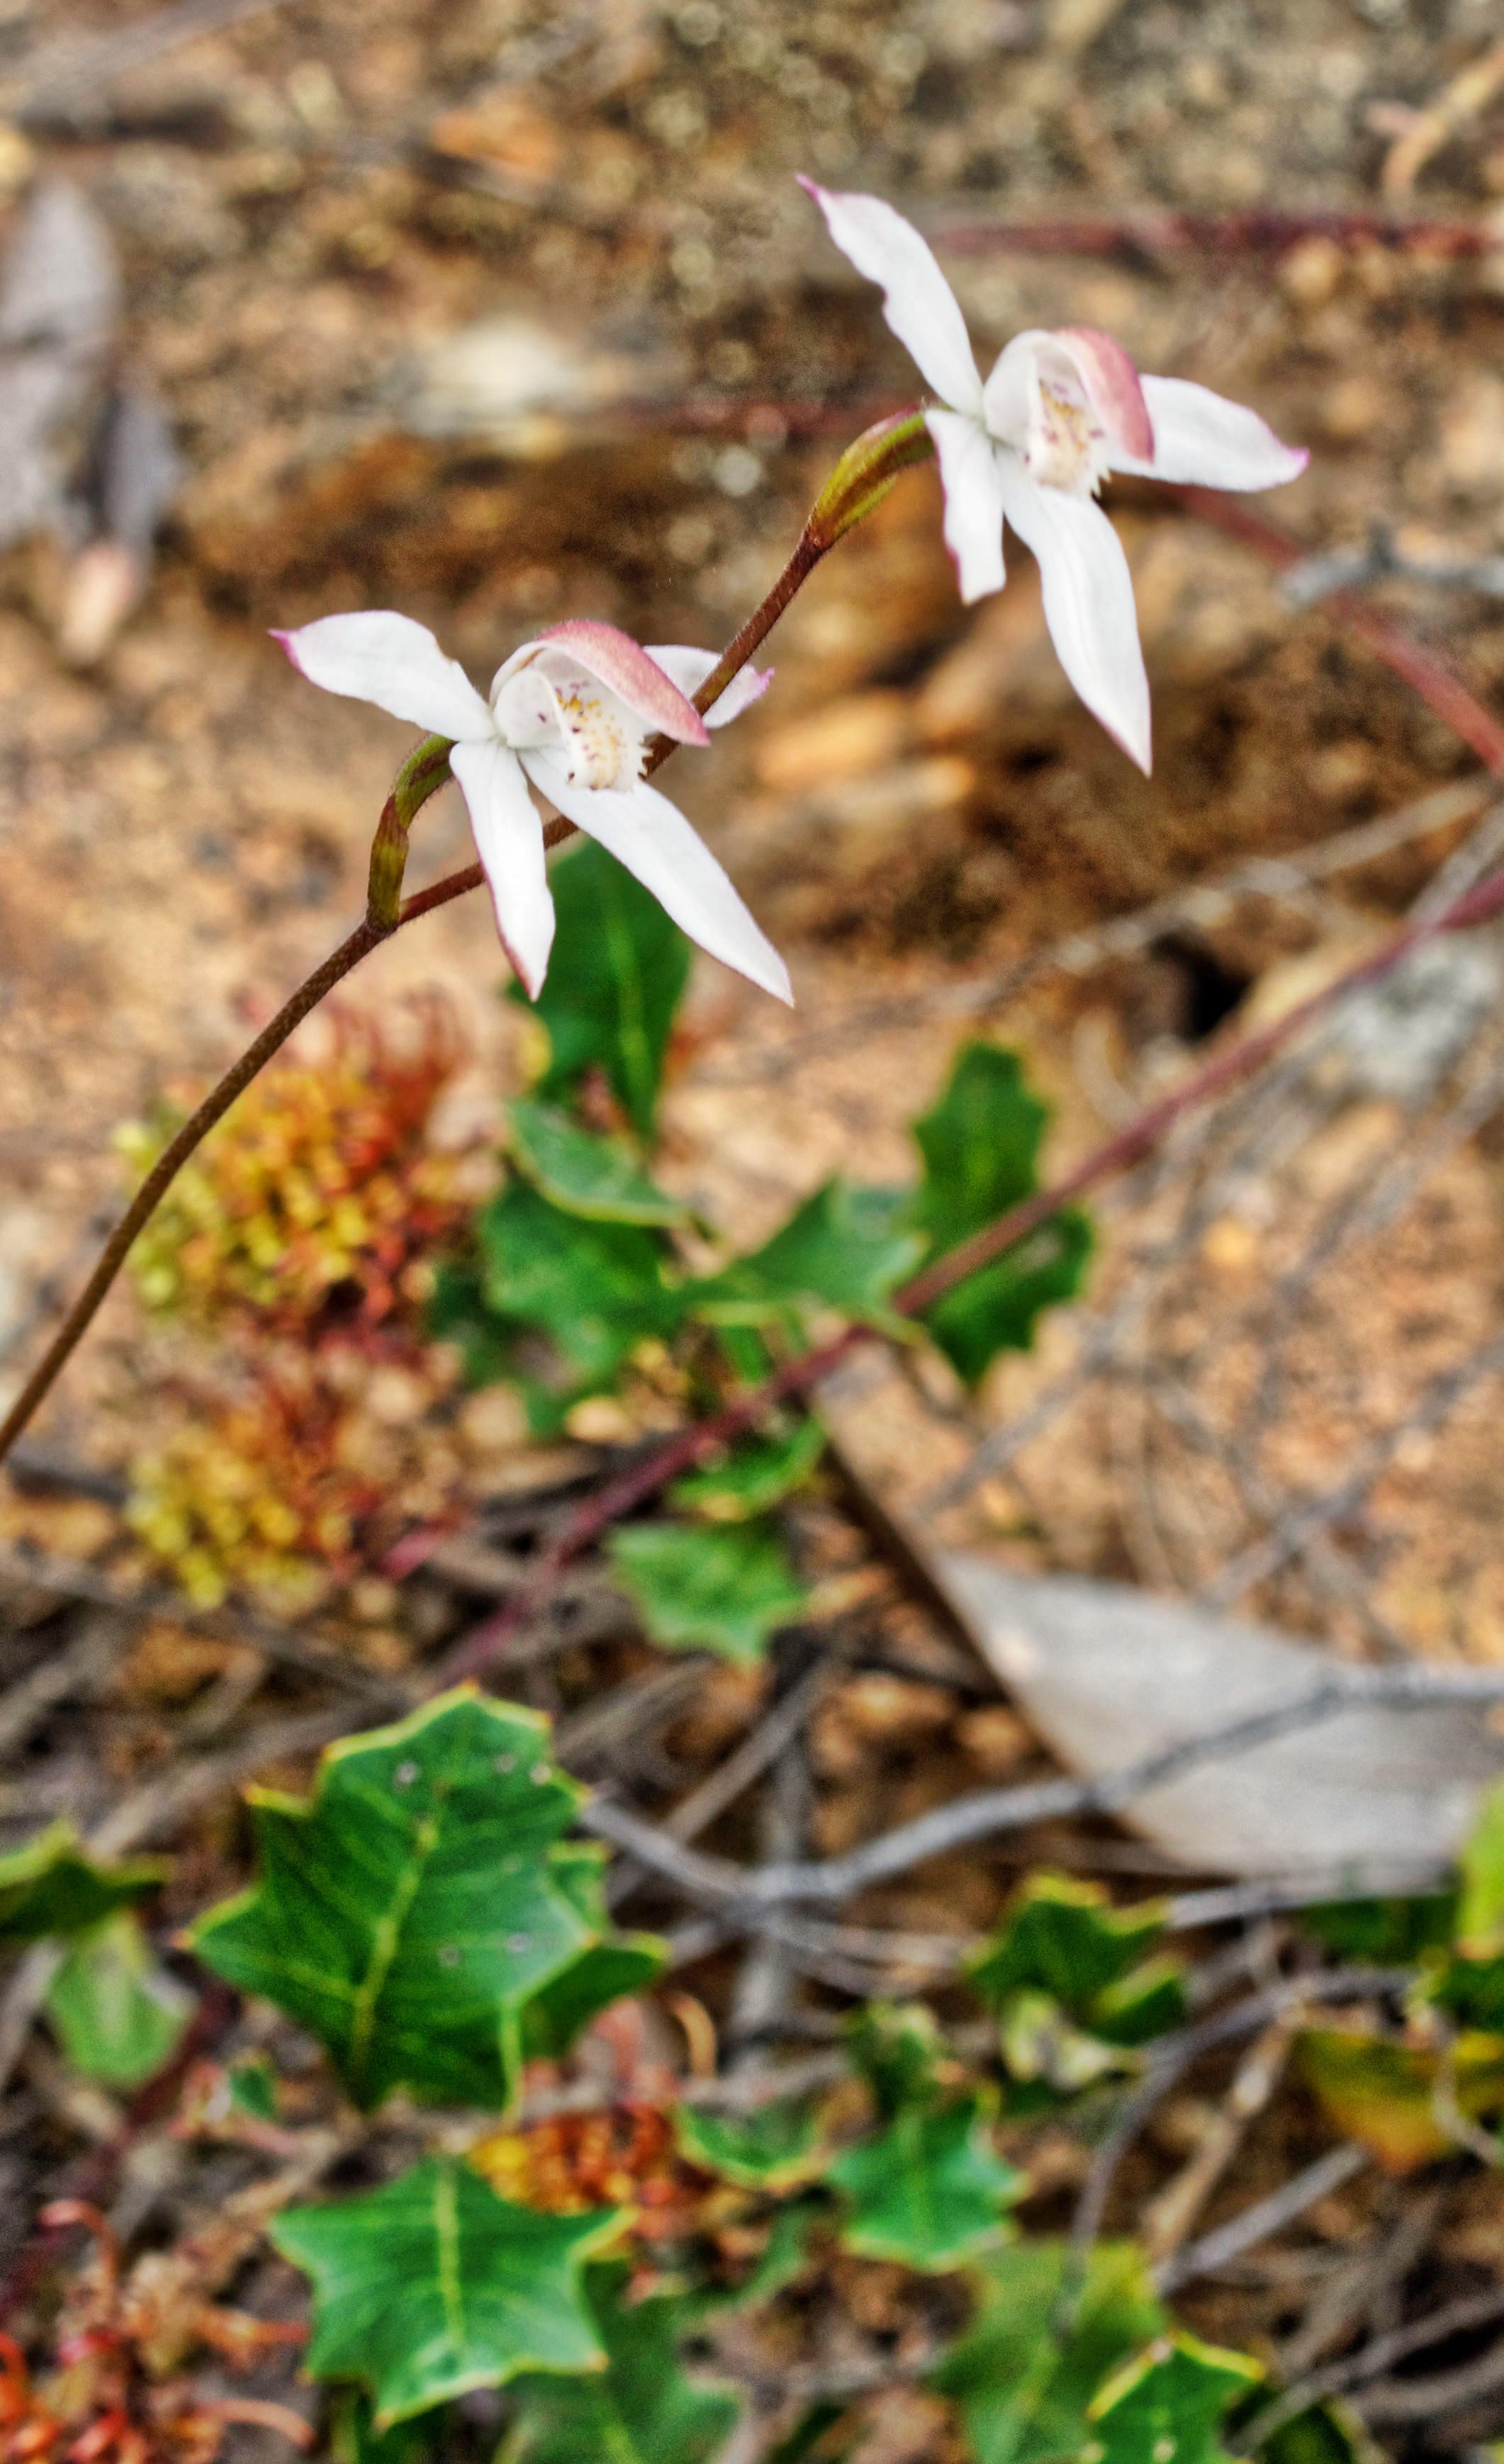 Caladenia-gracilis-3.jpeg